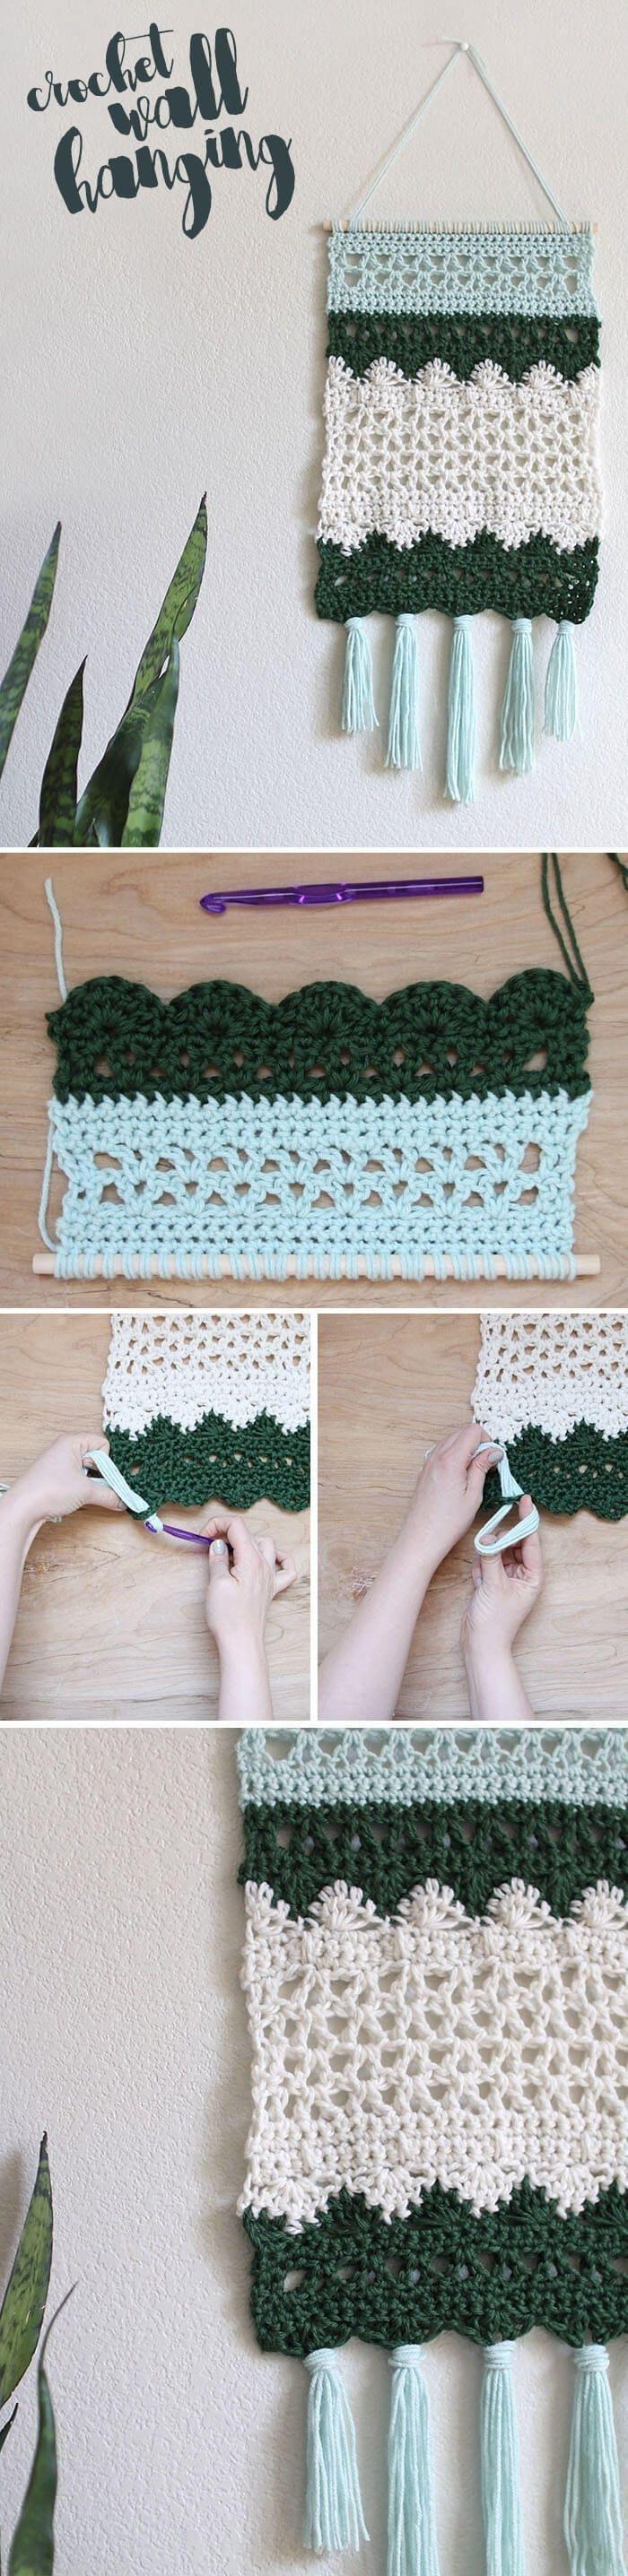 Crochet Wall Hanging Pattern | Crochet Wall Hangings, Wall Hangings Pertaining To Latest Crochet Wall Art (View 17 of 20)